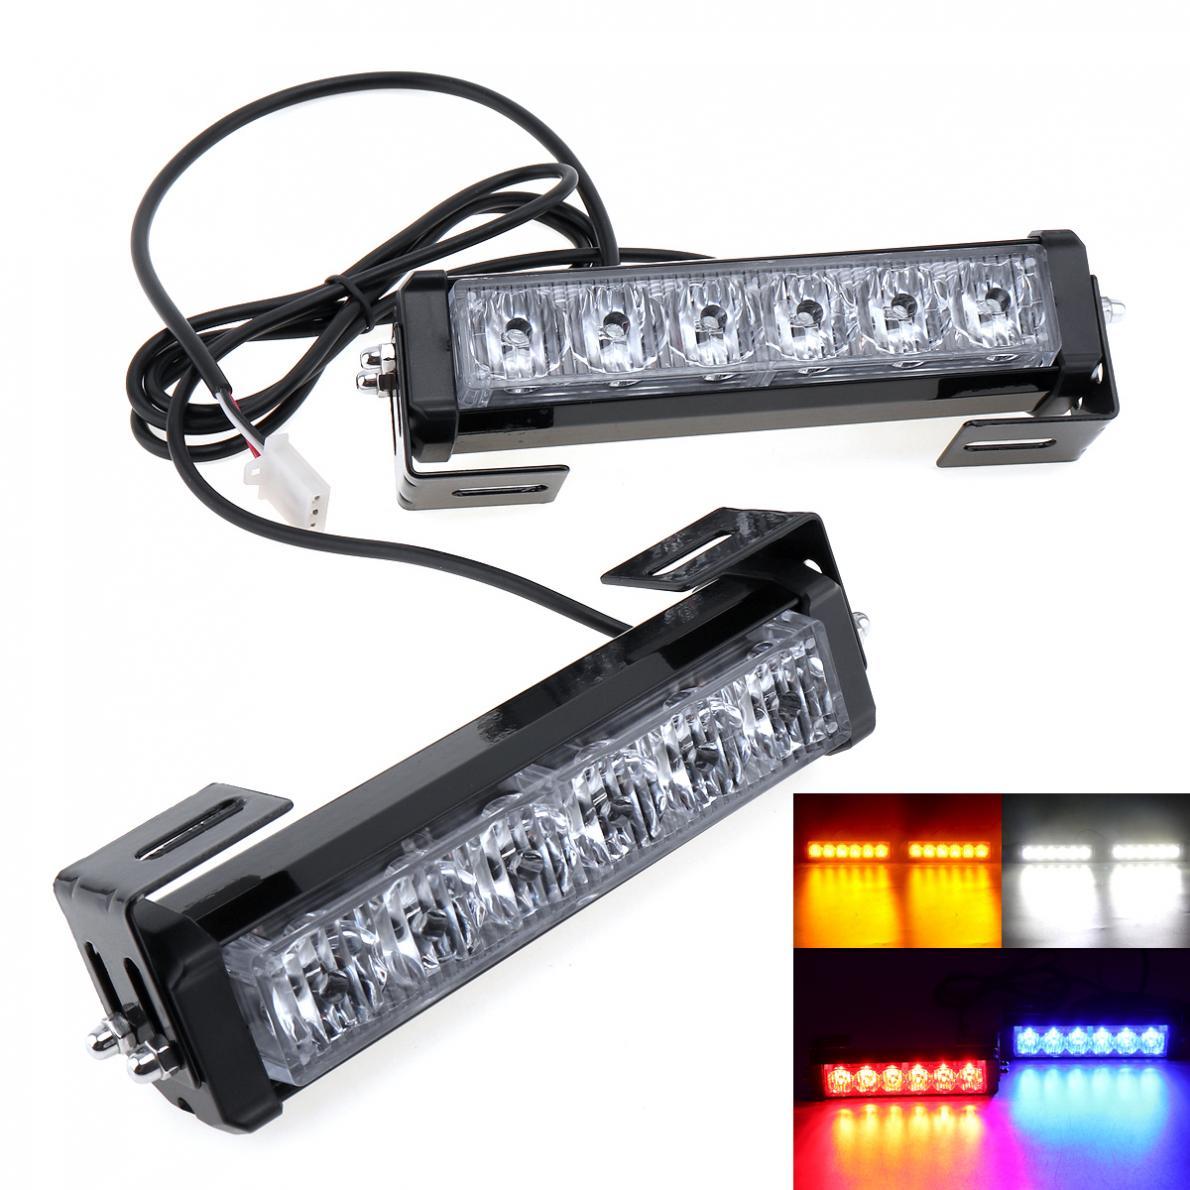 3000Lm DC 12V 36W Strobe Car Warning Light LED Daytime Running Police Emergency Light DRL Lamp for Truck Motorcycle Car SUV